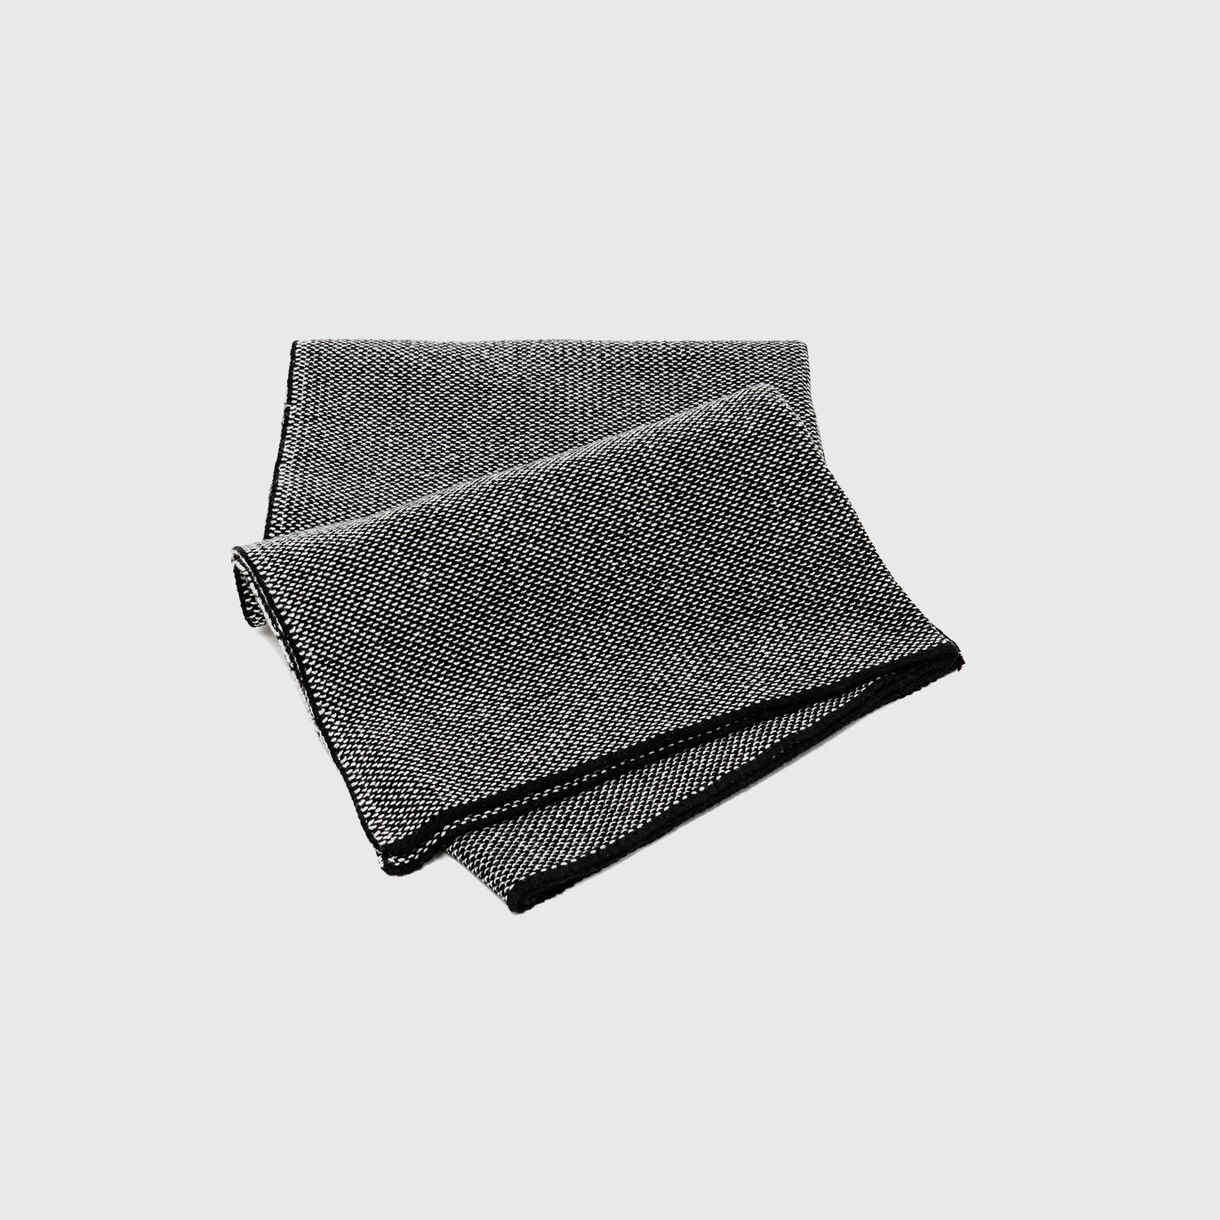 Tramato Blanket, Black